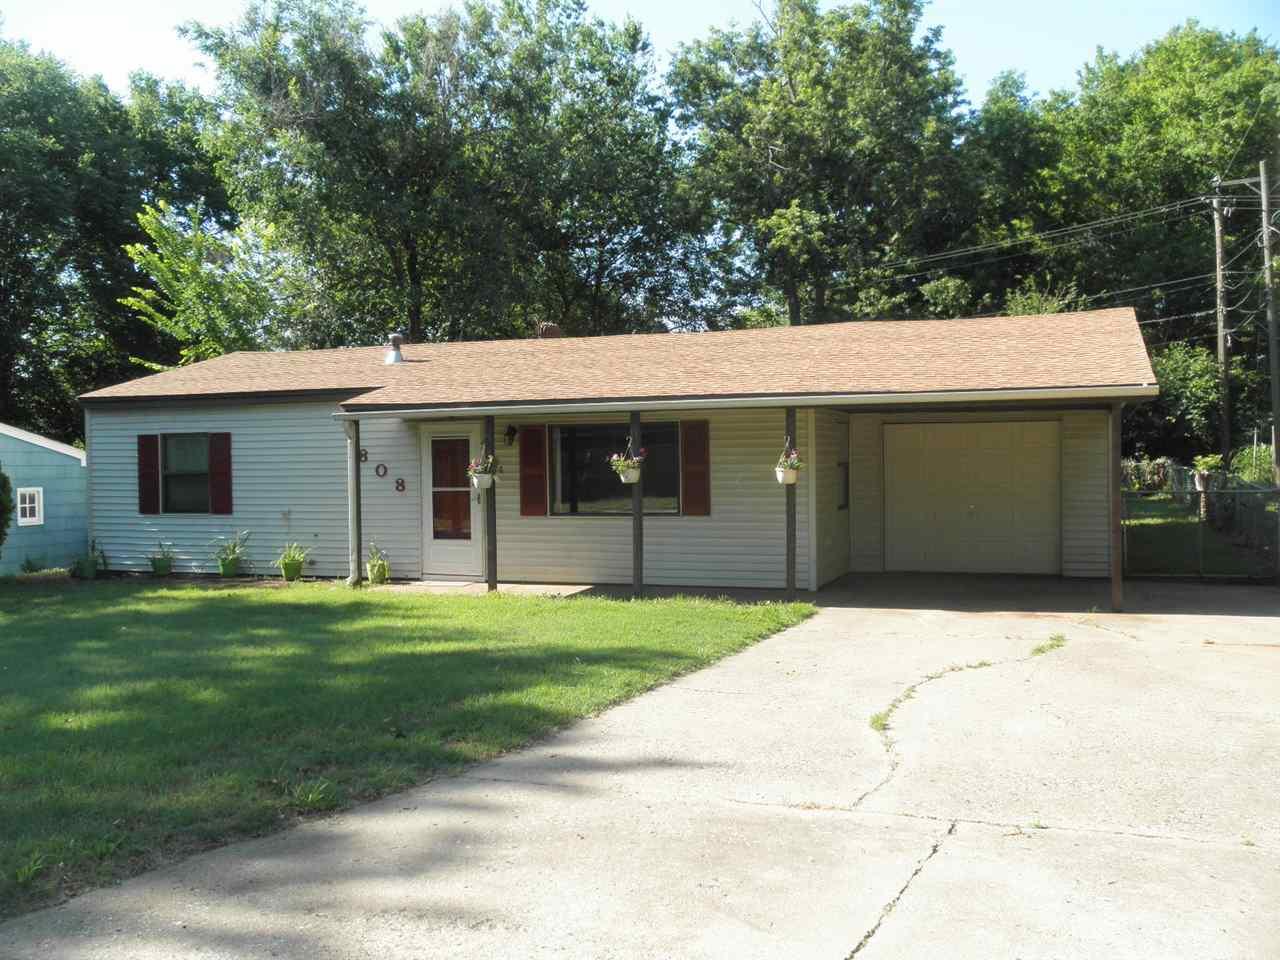 Sold Cross Sale W/ MLS | 808 Gray  Ponca City, OK 74604 0